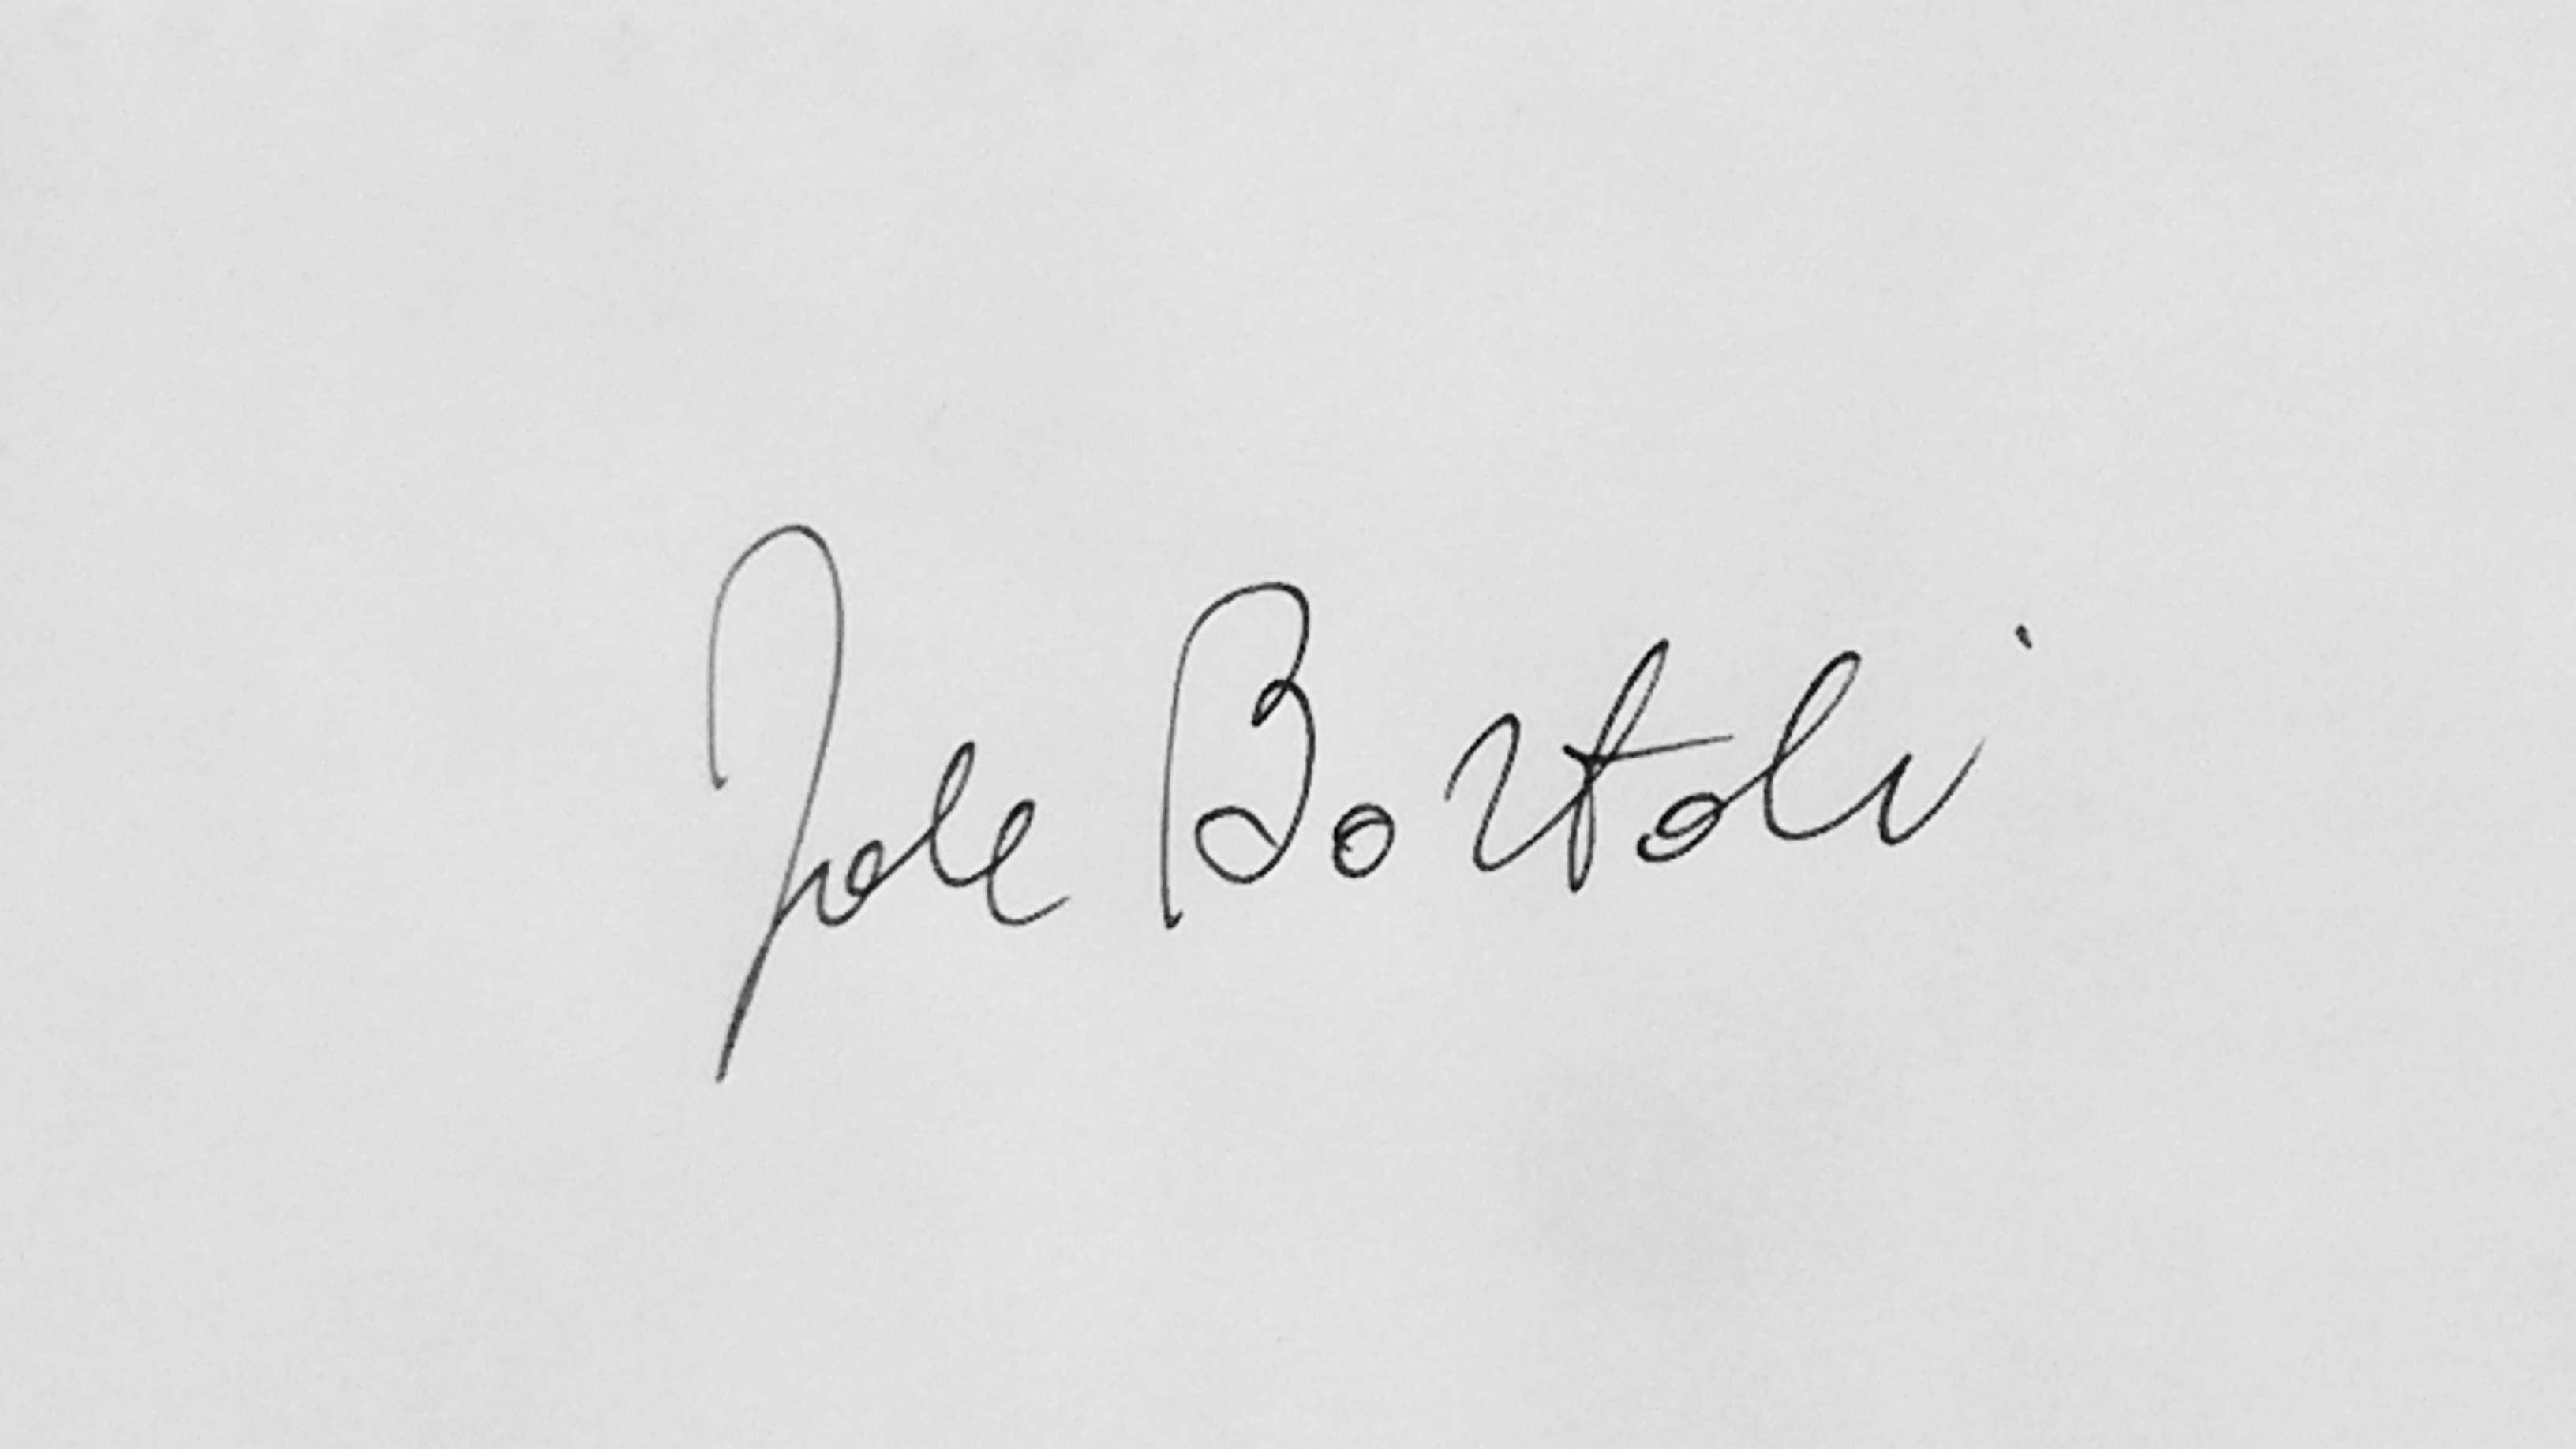 Jole Bortoli's Signature